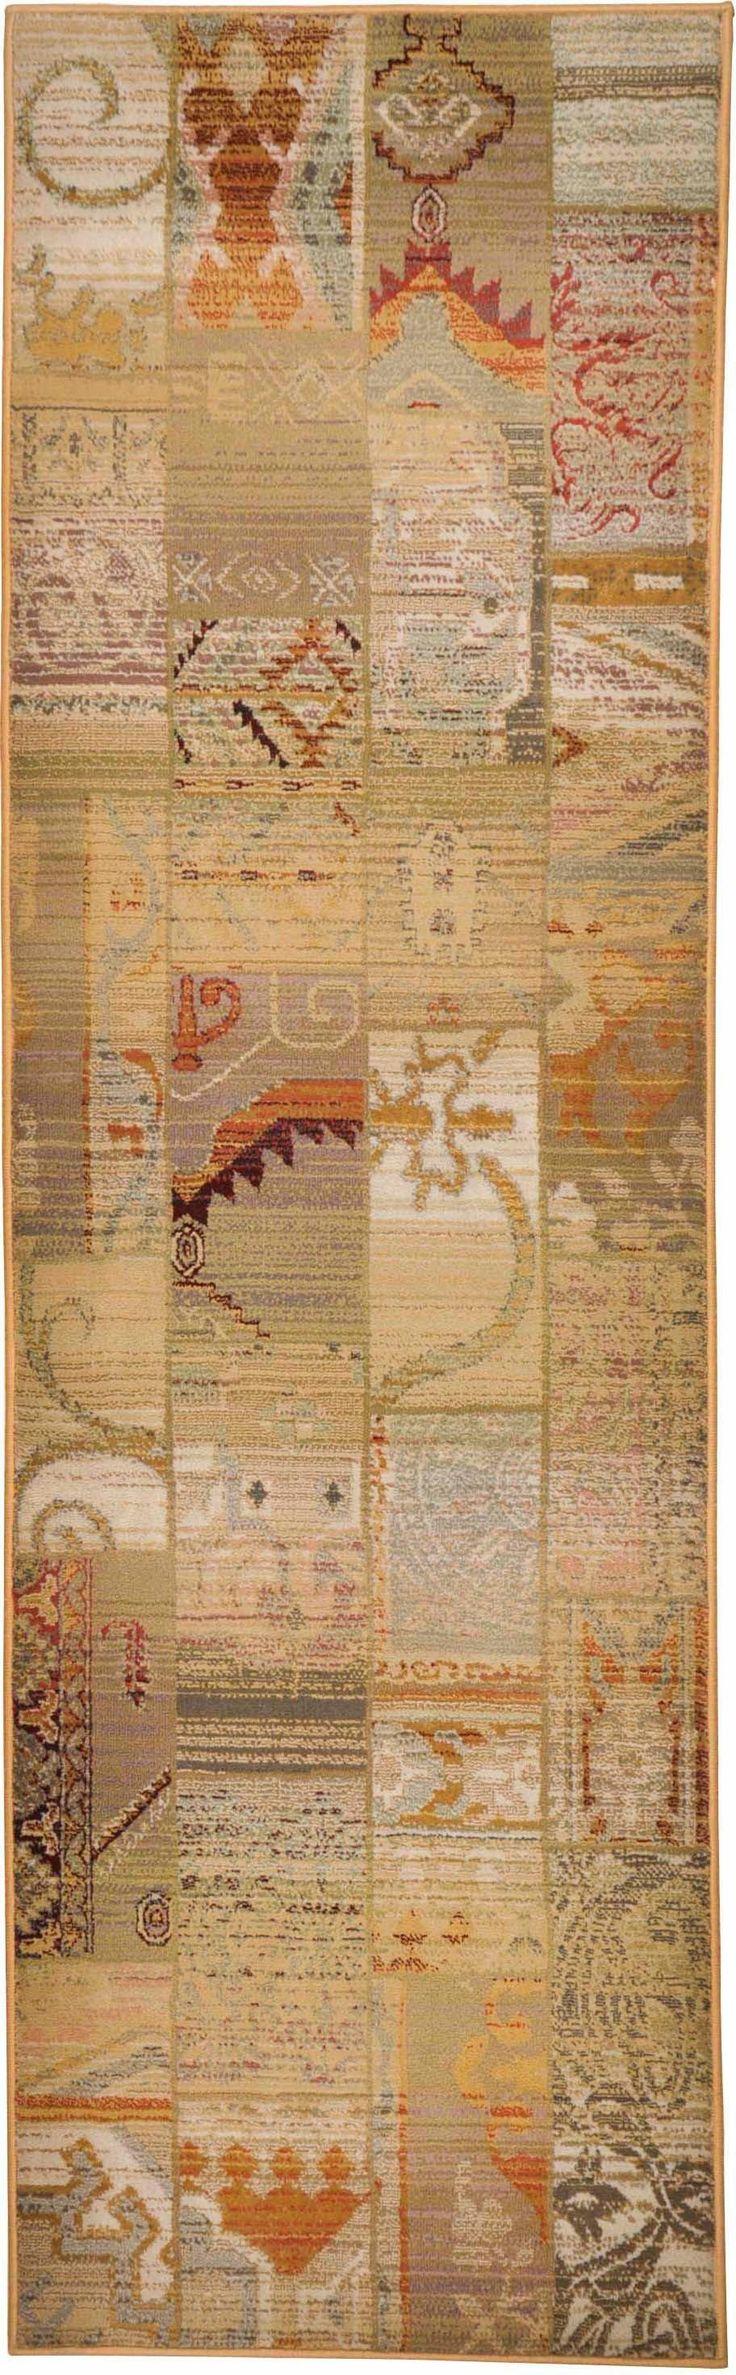 Läufer, Oriental Weavers, »Gabiro 5504«, Melange-Effekt, gewebt Jetzt bestellen unter: https://moebel.ladendirekt.de/heimtextilien/teppiche/laeufer/?uid=116d4ecc-2b66-5d65-afeb-01987c09494a&utm_source=pinterest&utm_medium=pin&utm_campaign=boards #möbel #laeufer #heimtextilien #orientteppiche #teppiche